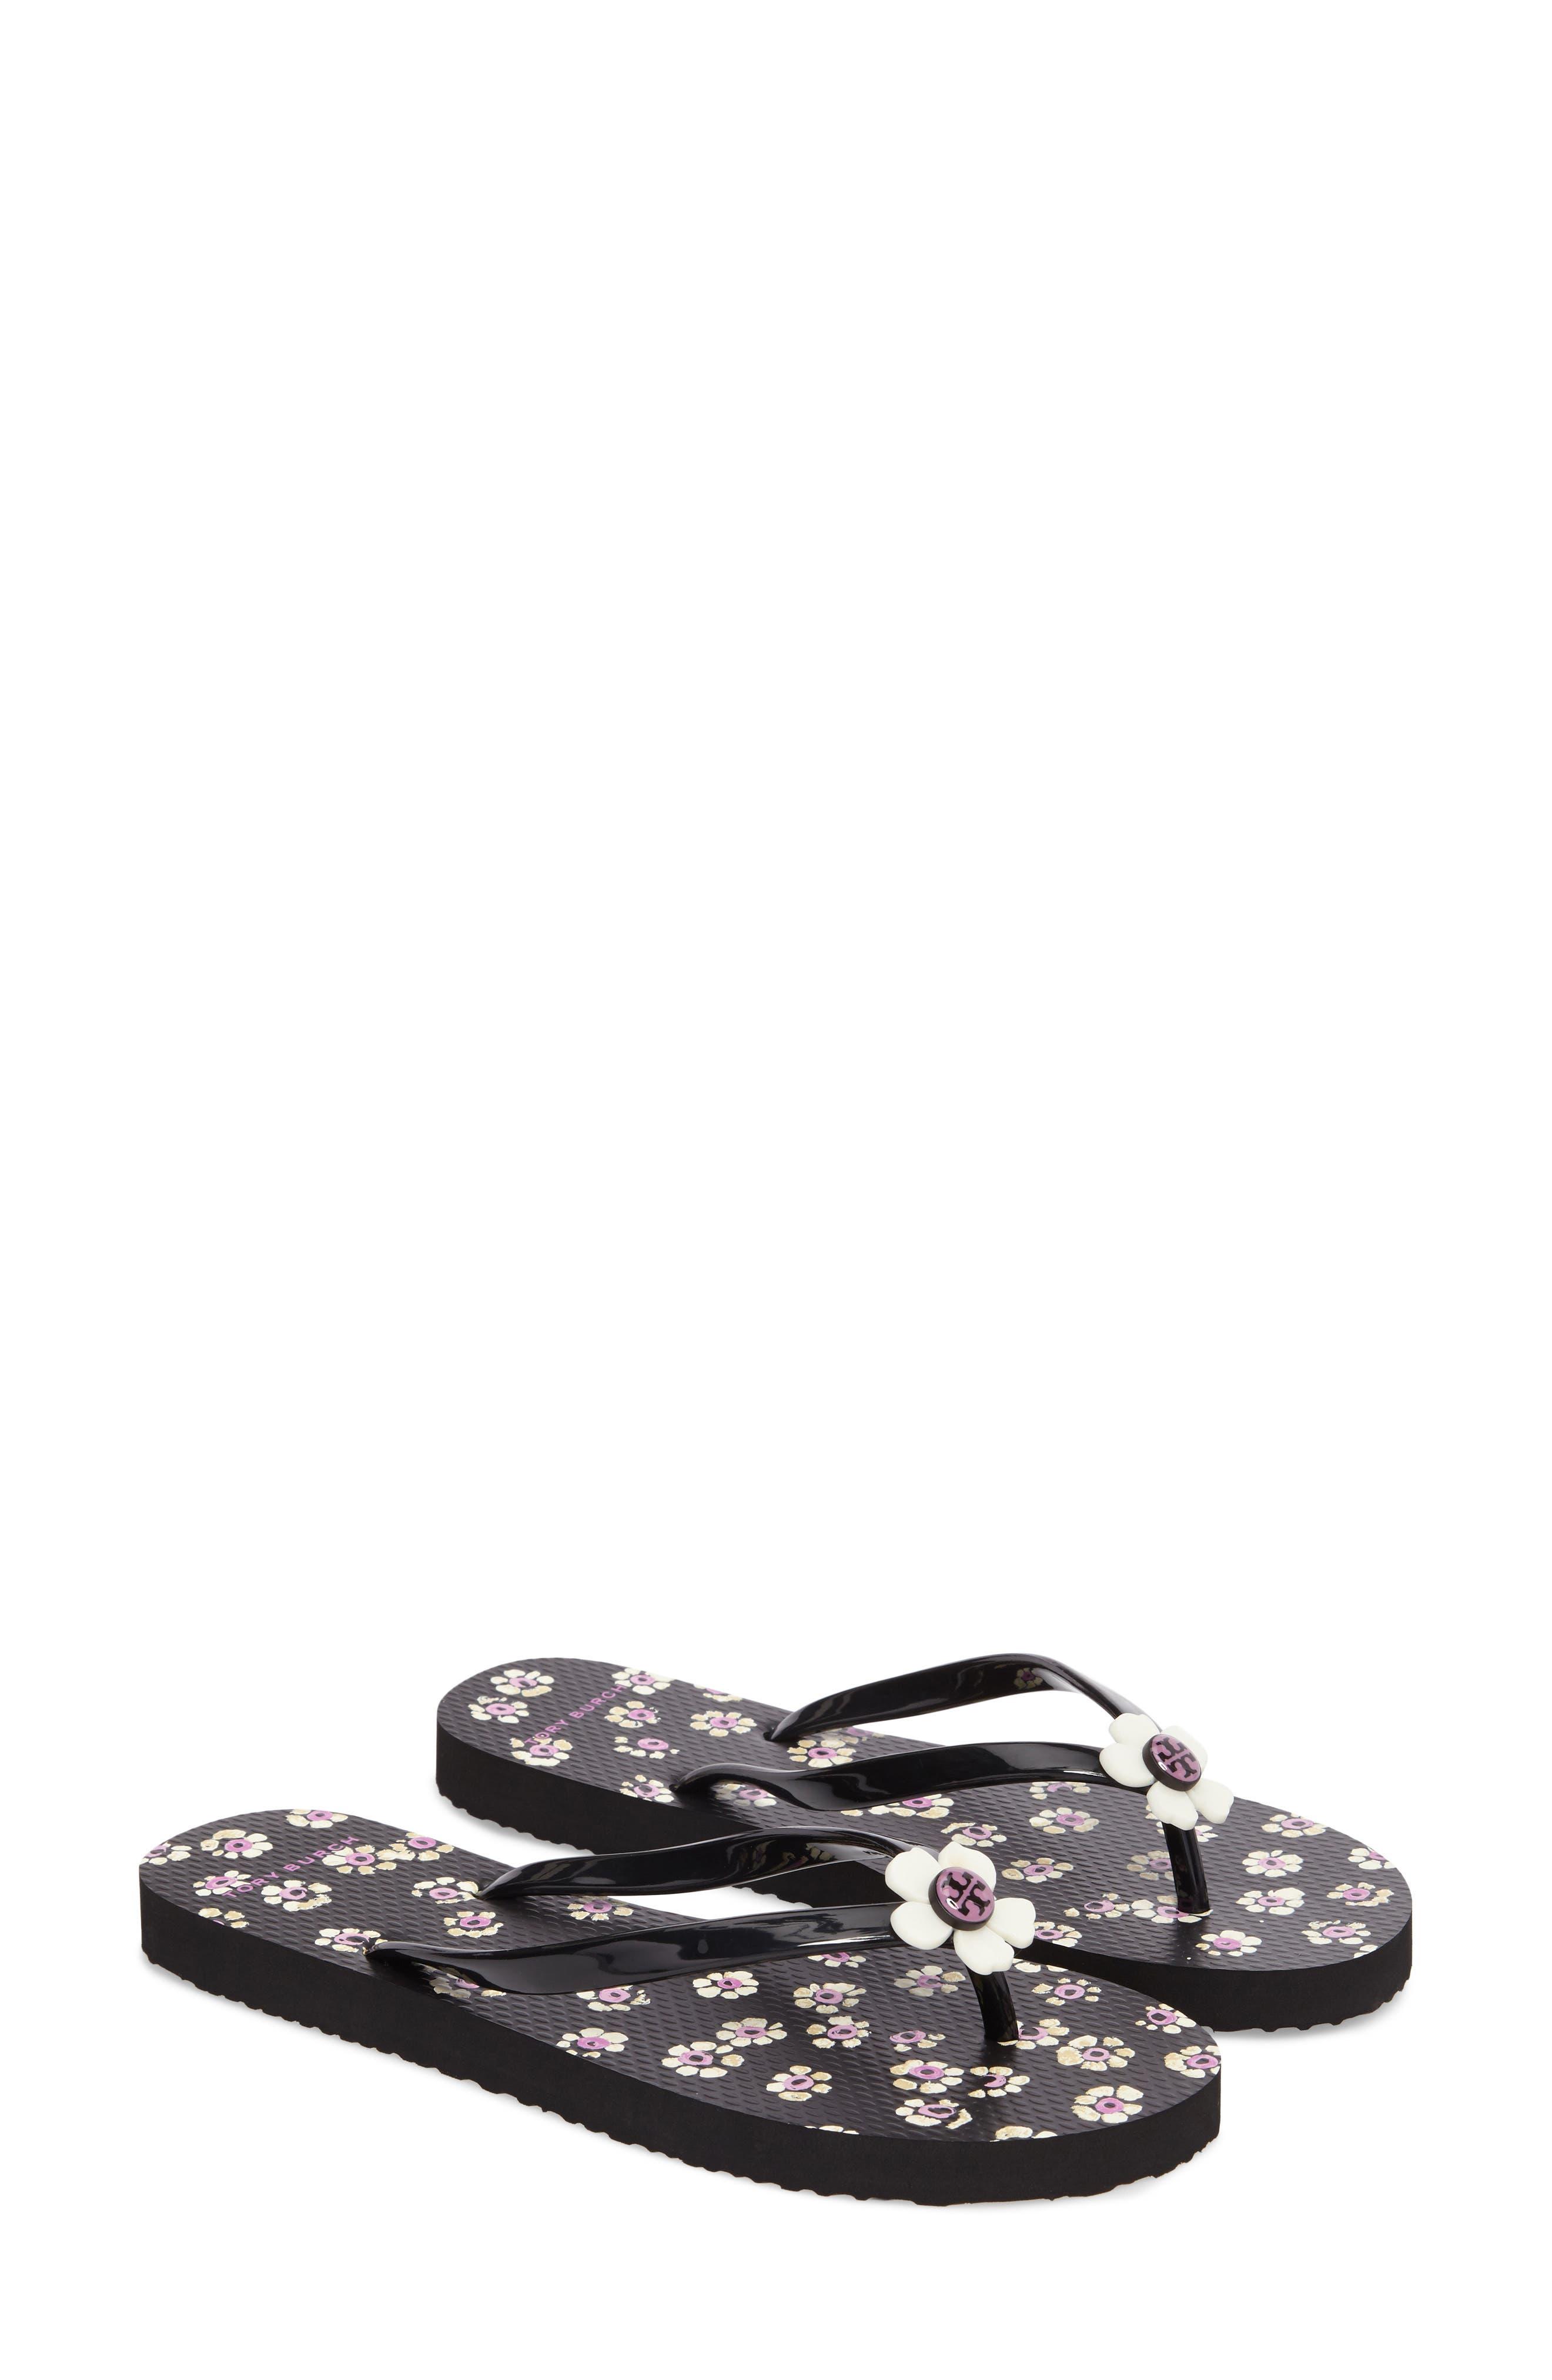 Alternate Image 1 Selected - Tory Burch Flower Flip-Flop (Women)